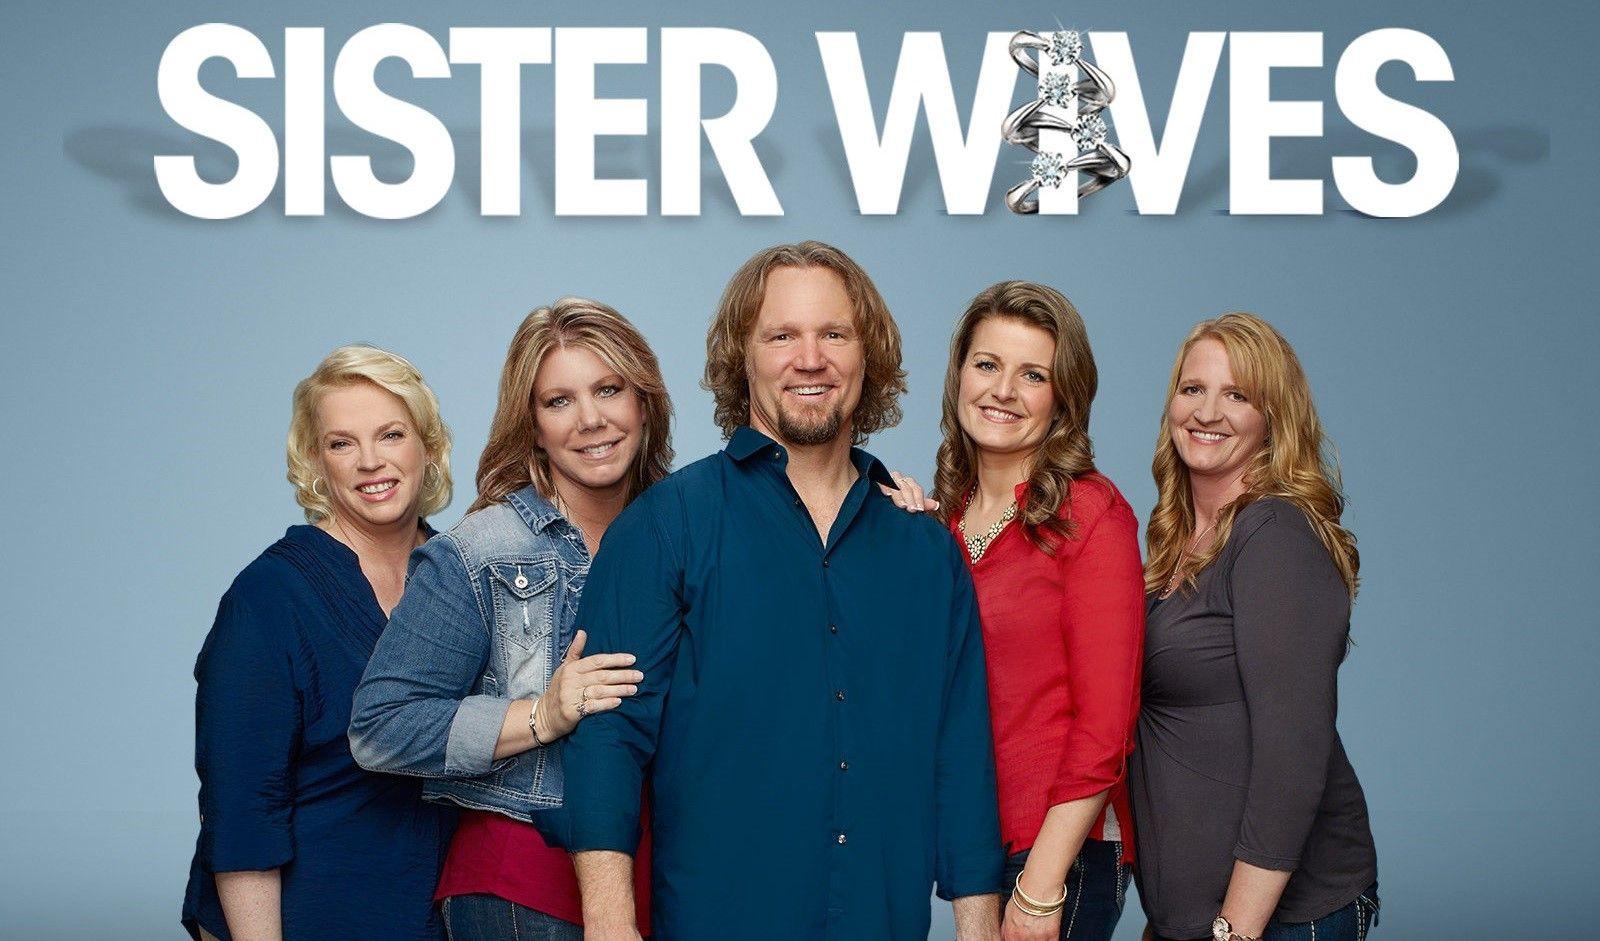 Sister Wives Season 15 release date